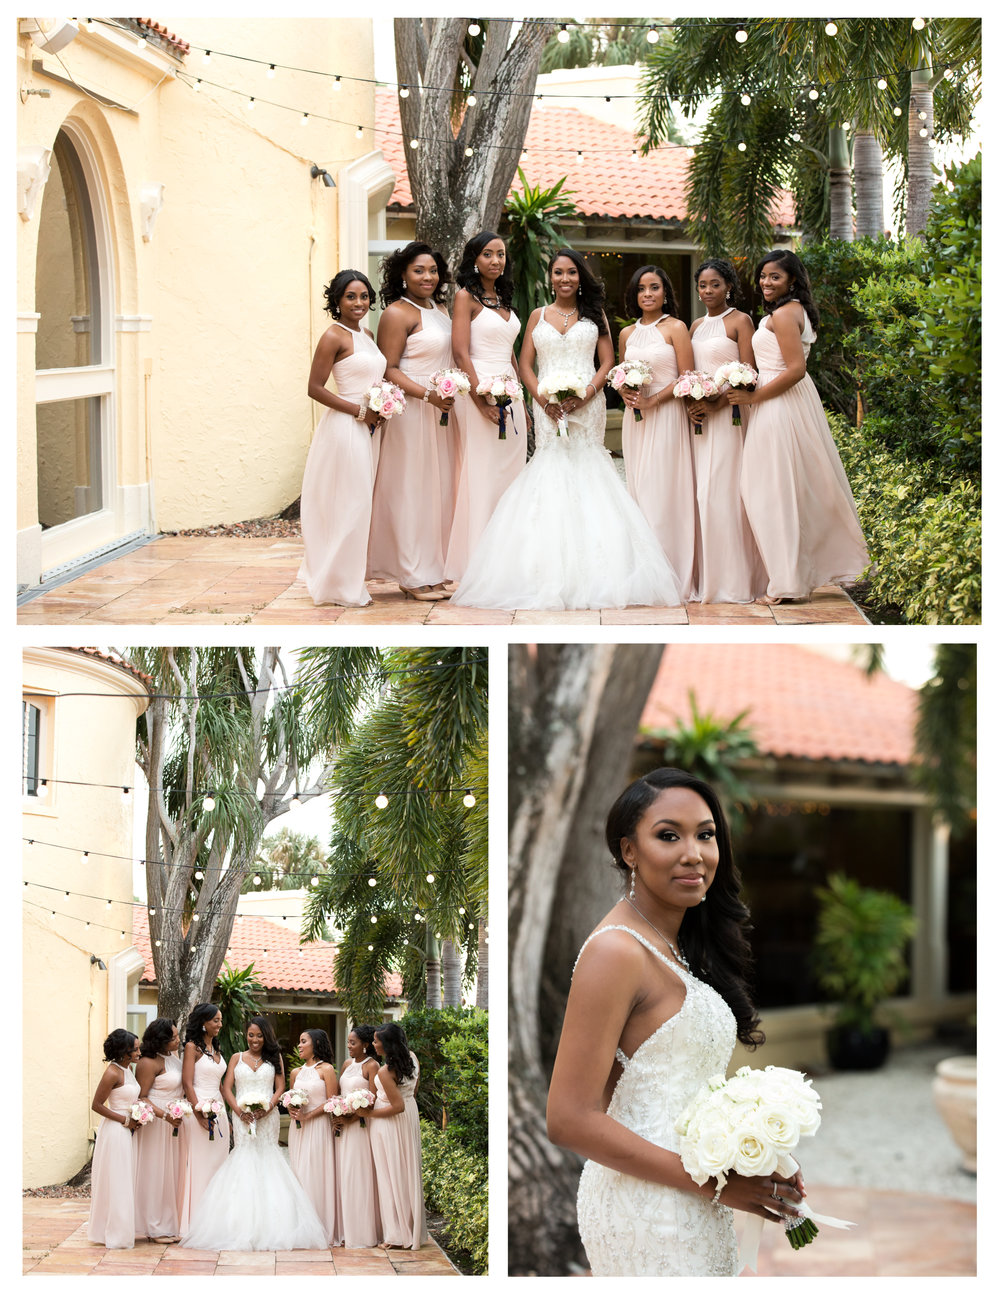 Benvenuto_wedding_Boynton_Beach_Jodi_Fjelde_Photography_Nikki_Otis_married_11.jpg